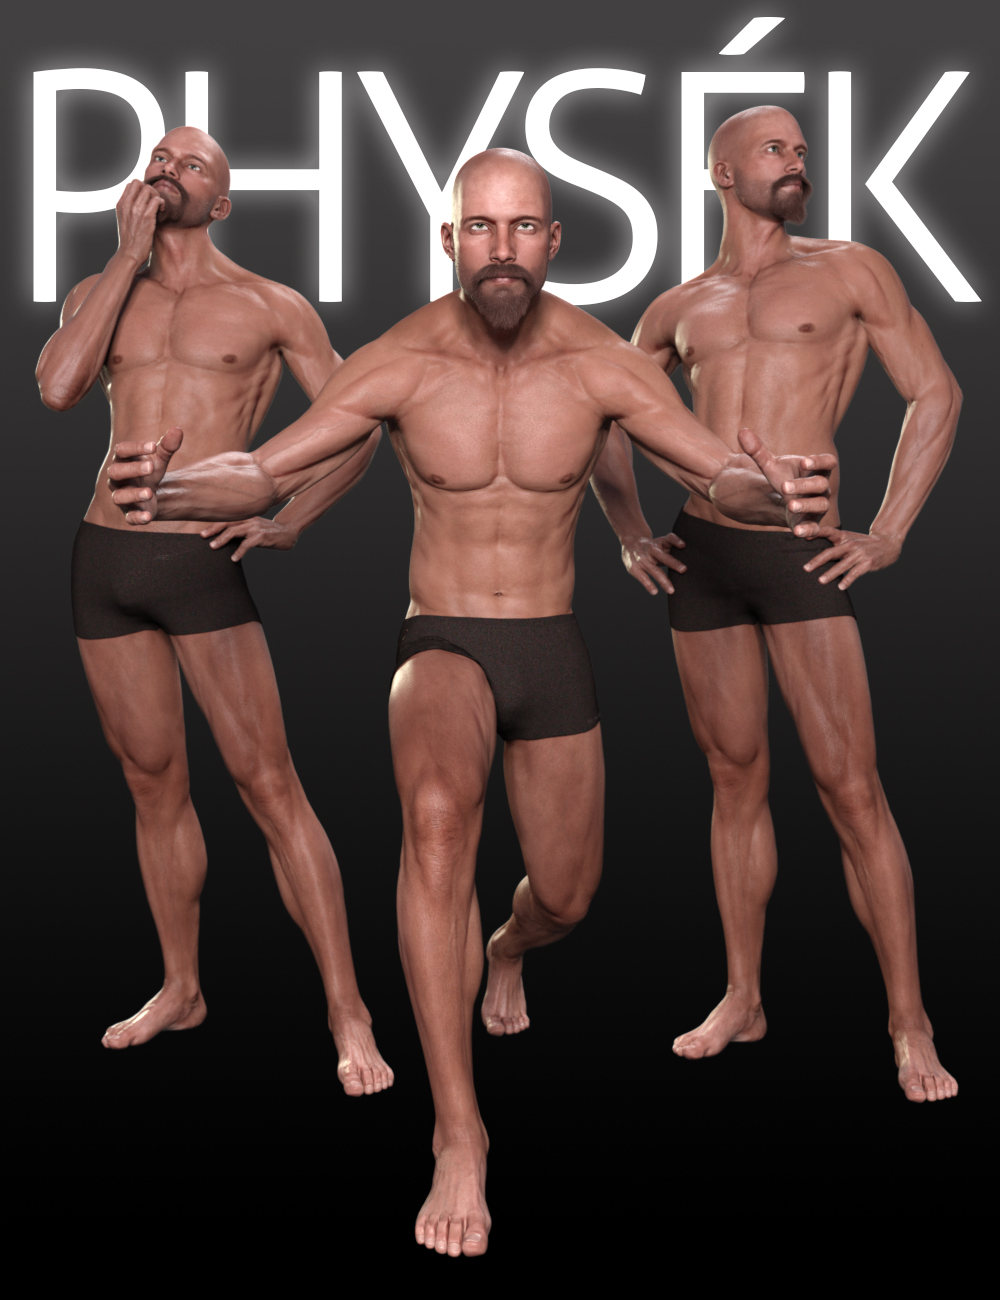 PHYSEK Poses for Michael 7 & Leo 7 by: Shimuzu, 3D Models by Daz 3D